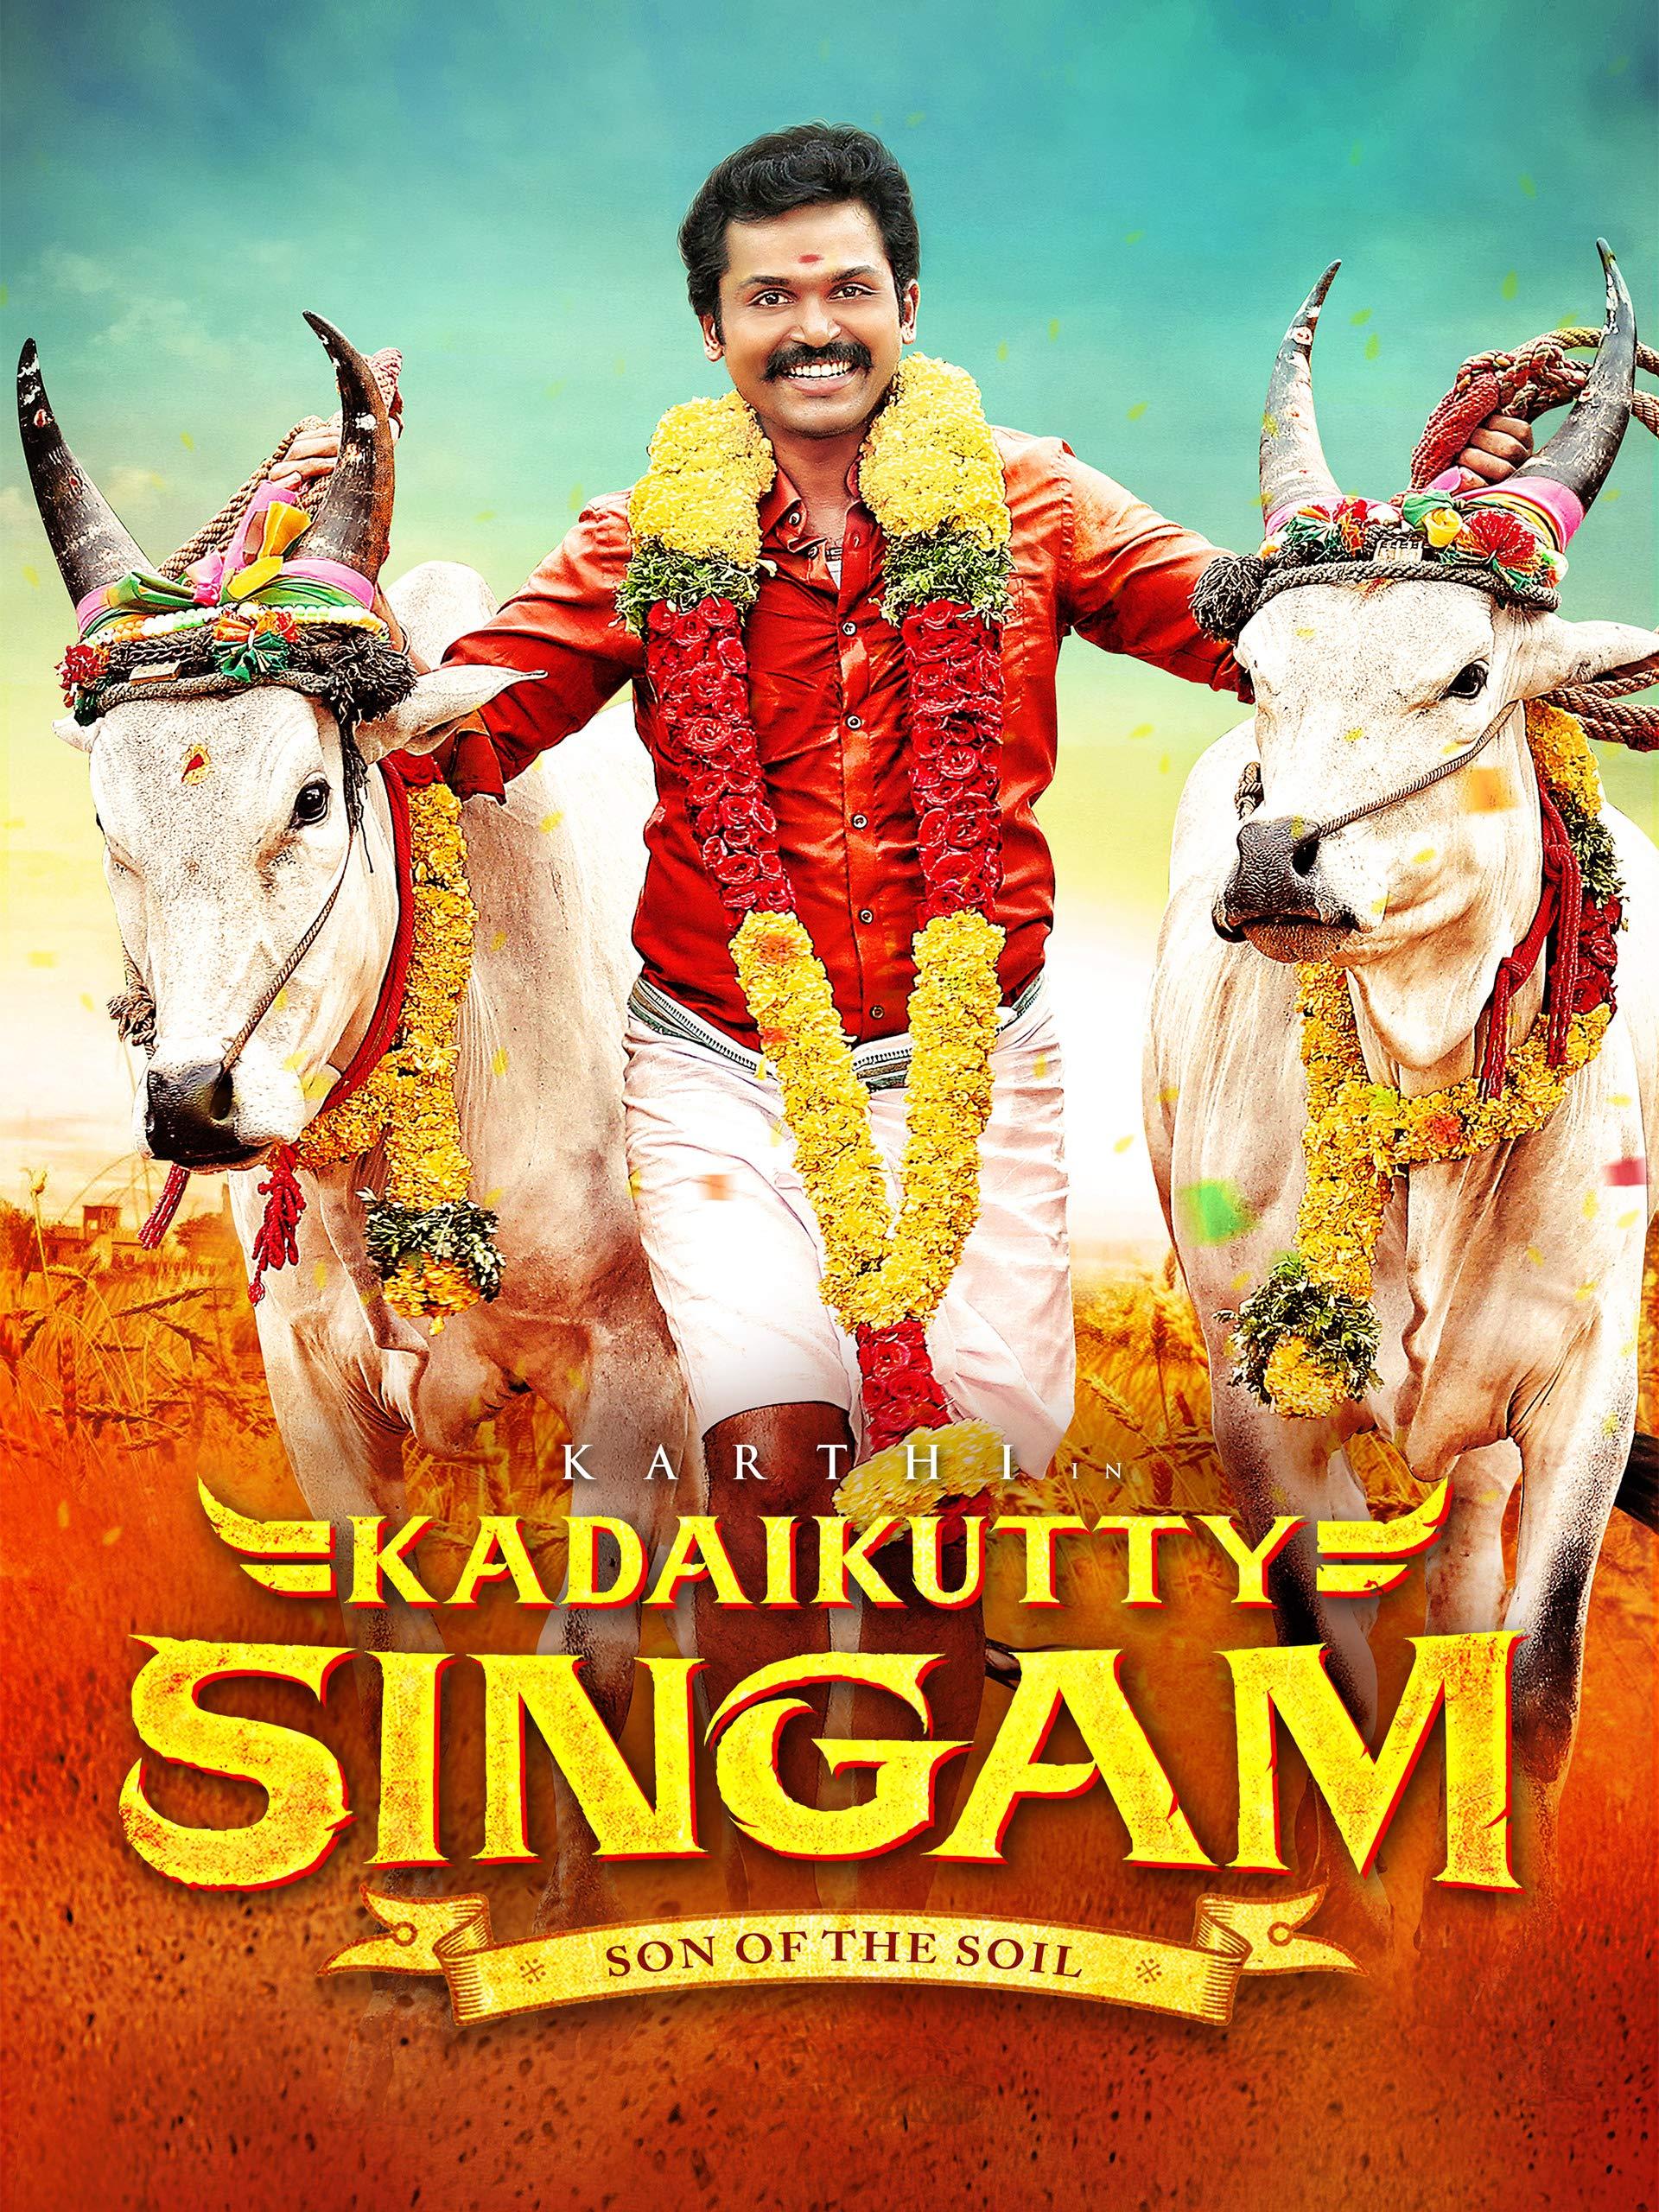 kadaikutty singam hd movie watch online download